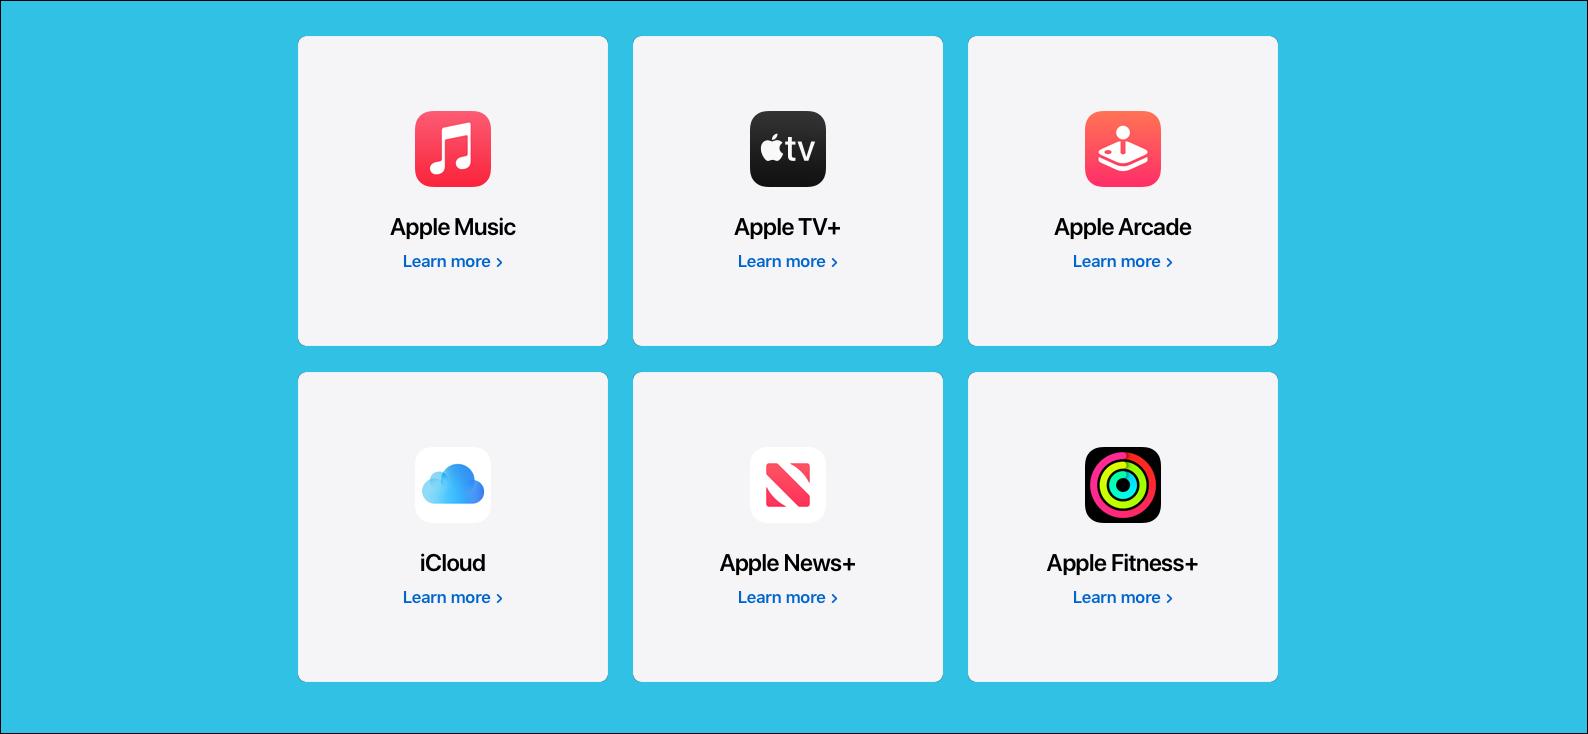 An Apple One bundle, including Apple Music, Apple TV+, Apple Arcade, iCloud, Apple News+, and Apple Fitness+.